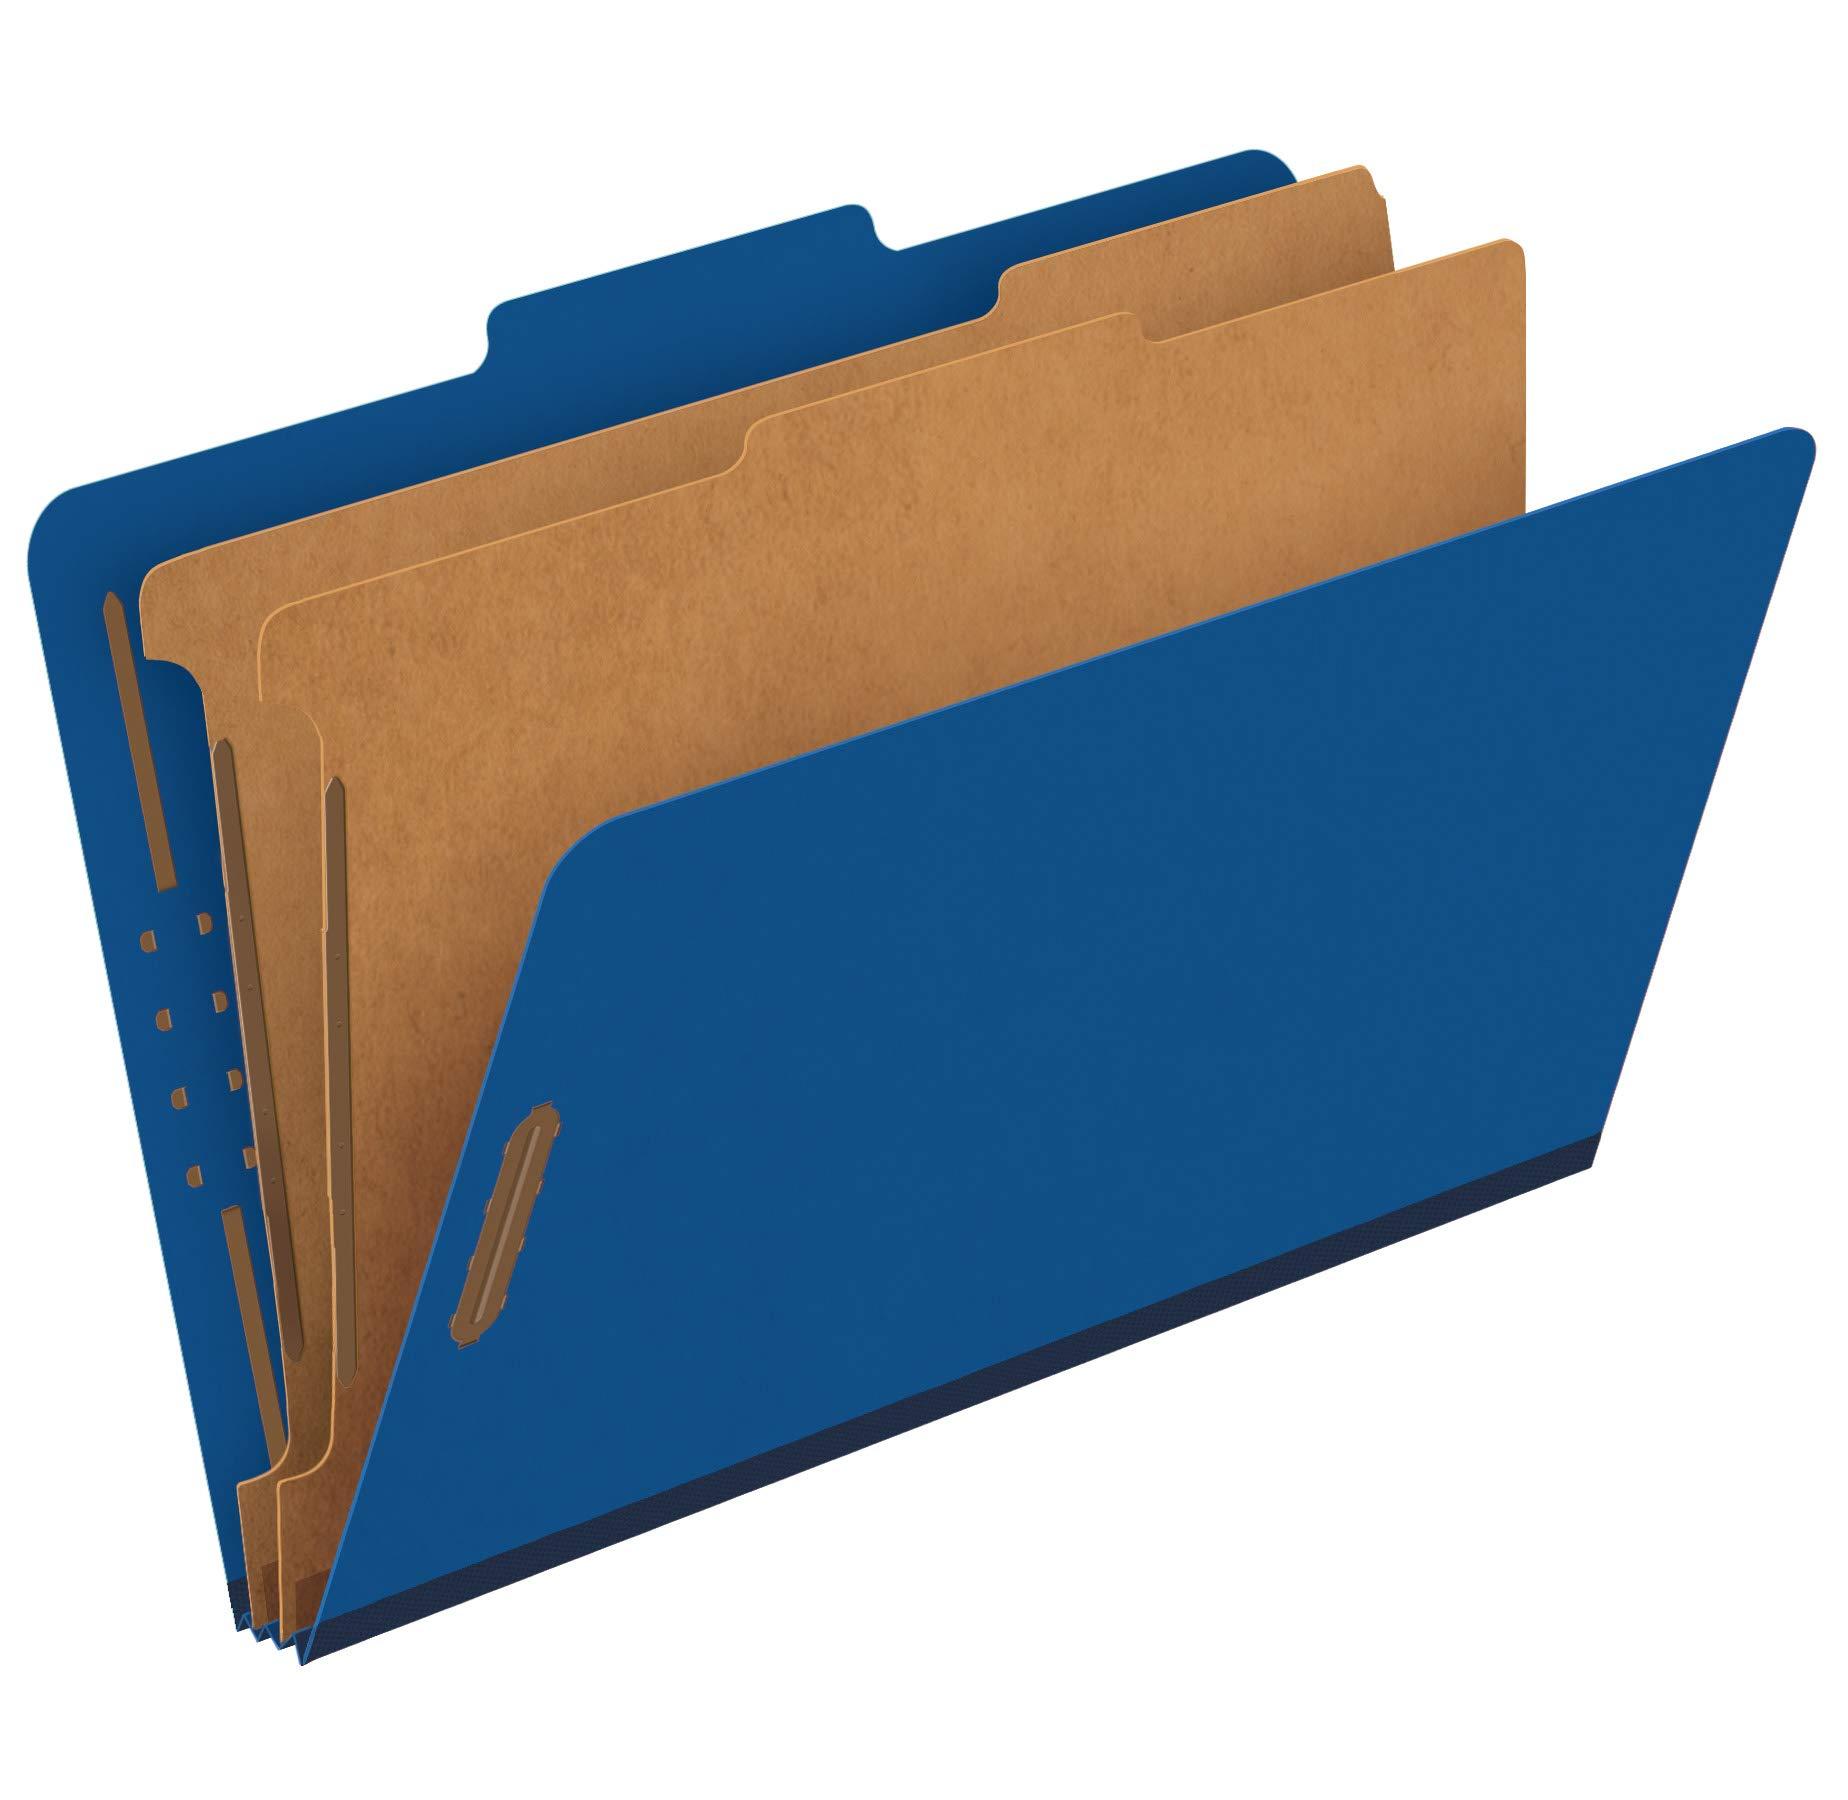 Pendaflex Recycled Classification File Folders, 2 Dividers, 2'' Embedded Fasteners, 2/5 Tab Cut, Legal Size, Dark Blue, Box of 10 (29035GW) by Pendaflex